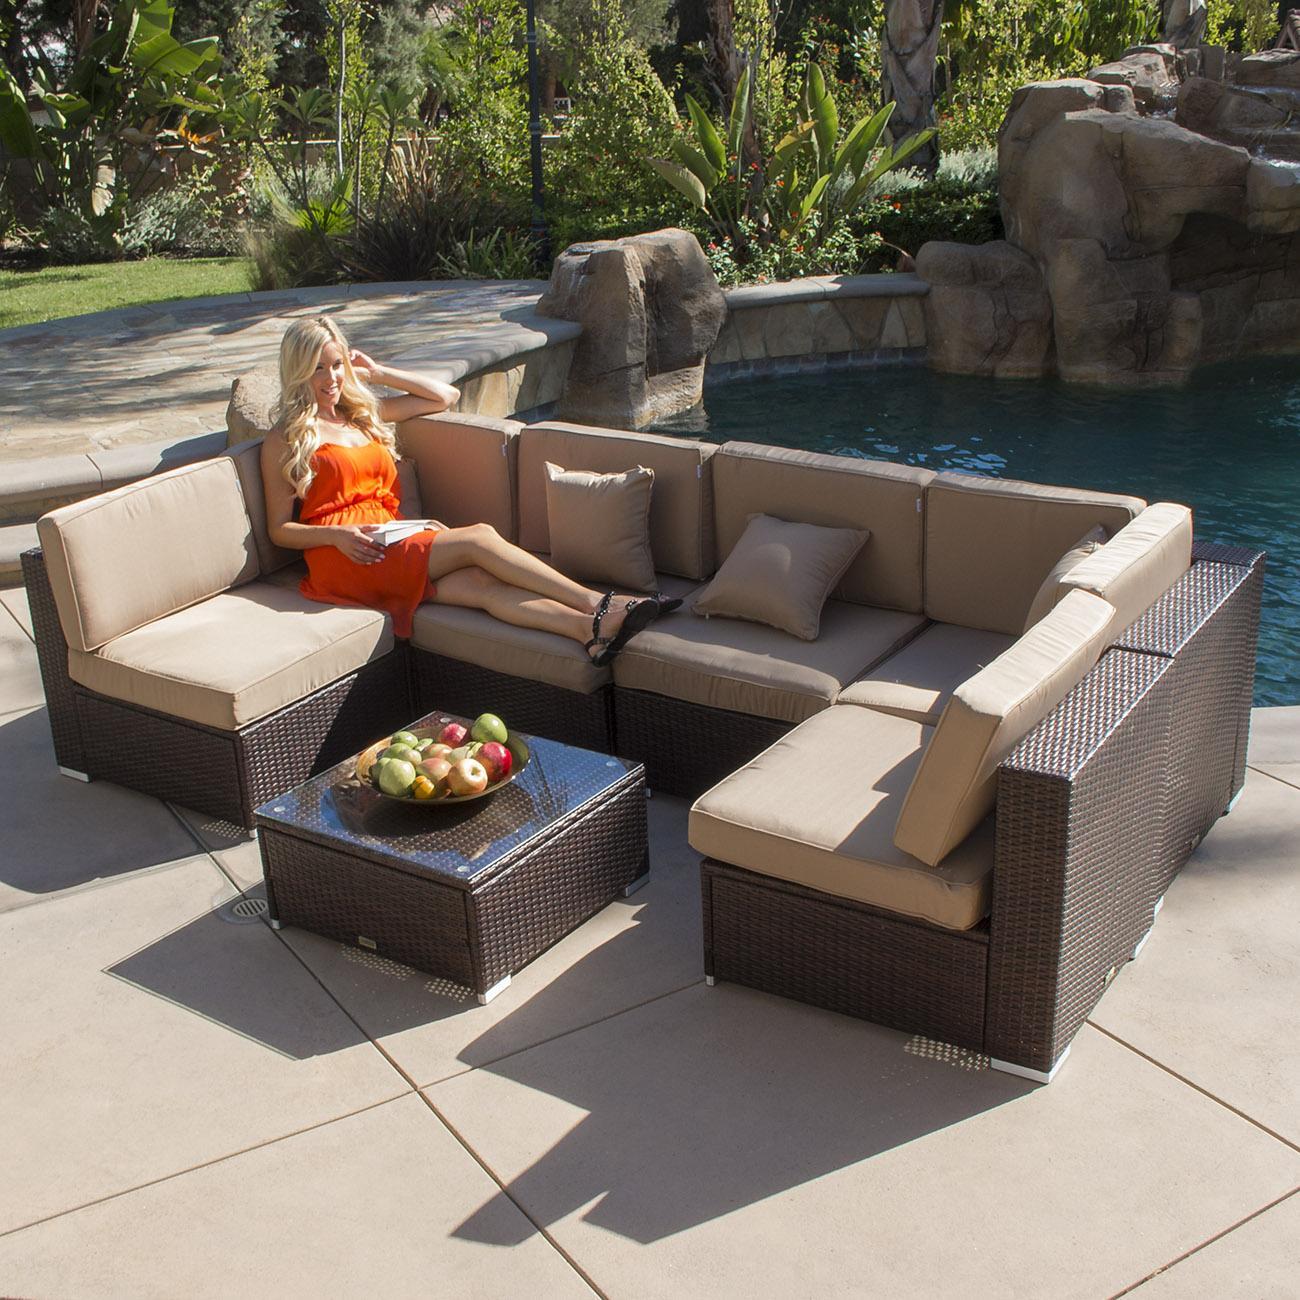 Outdoor Patio Sectional Sofa: 7pc Outdoor Patio Rattan Wicker Furniture Aluminum